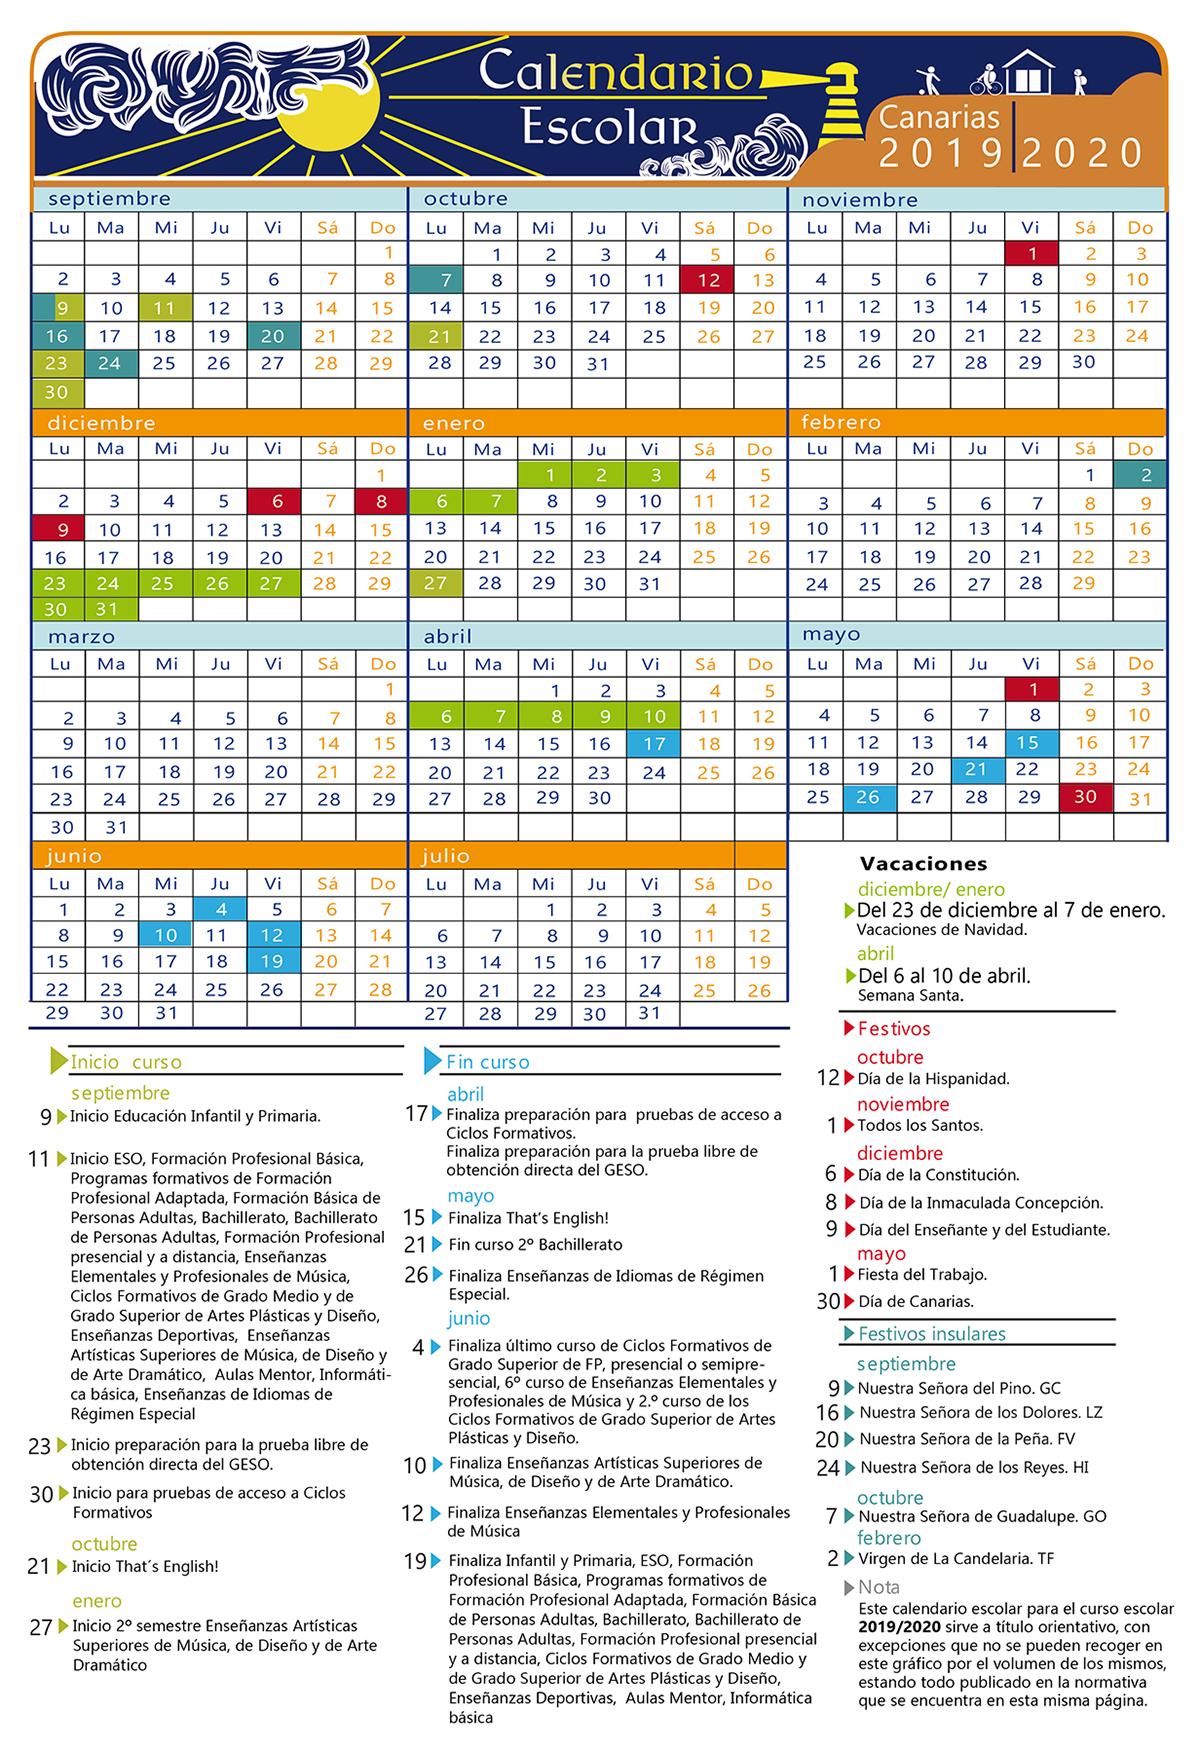 Calendario Escolar El Chikiplan